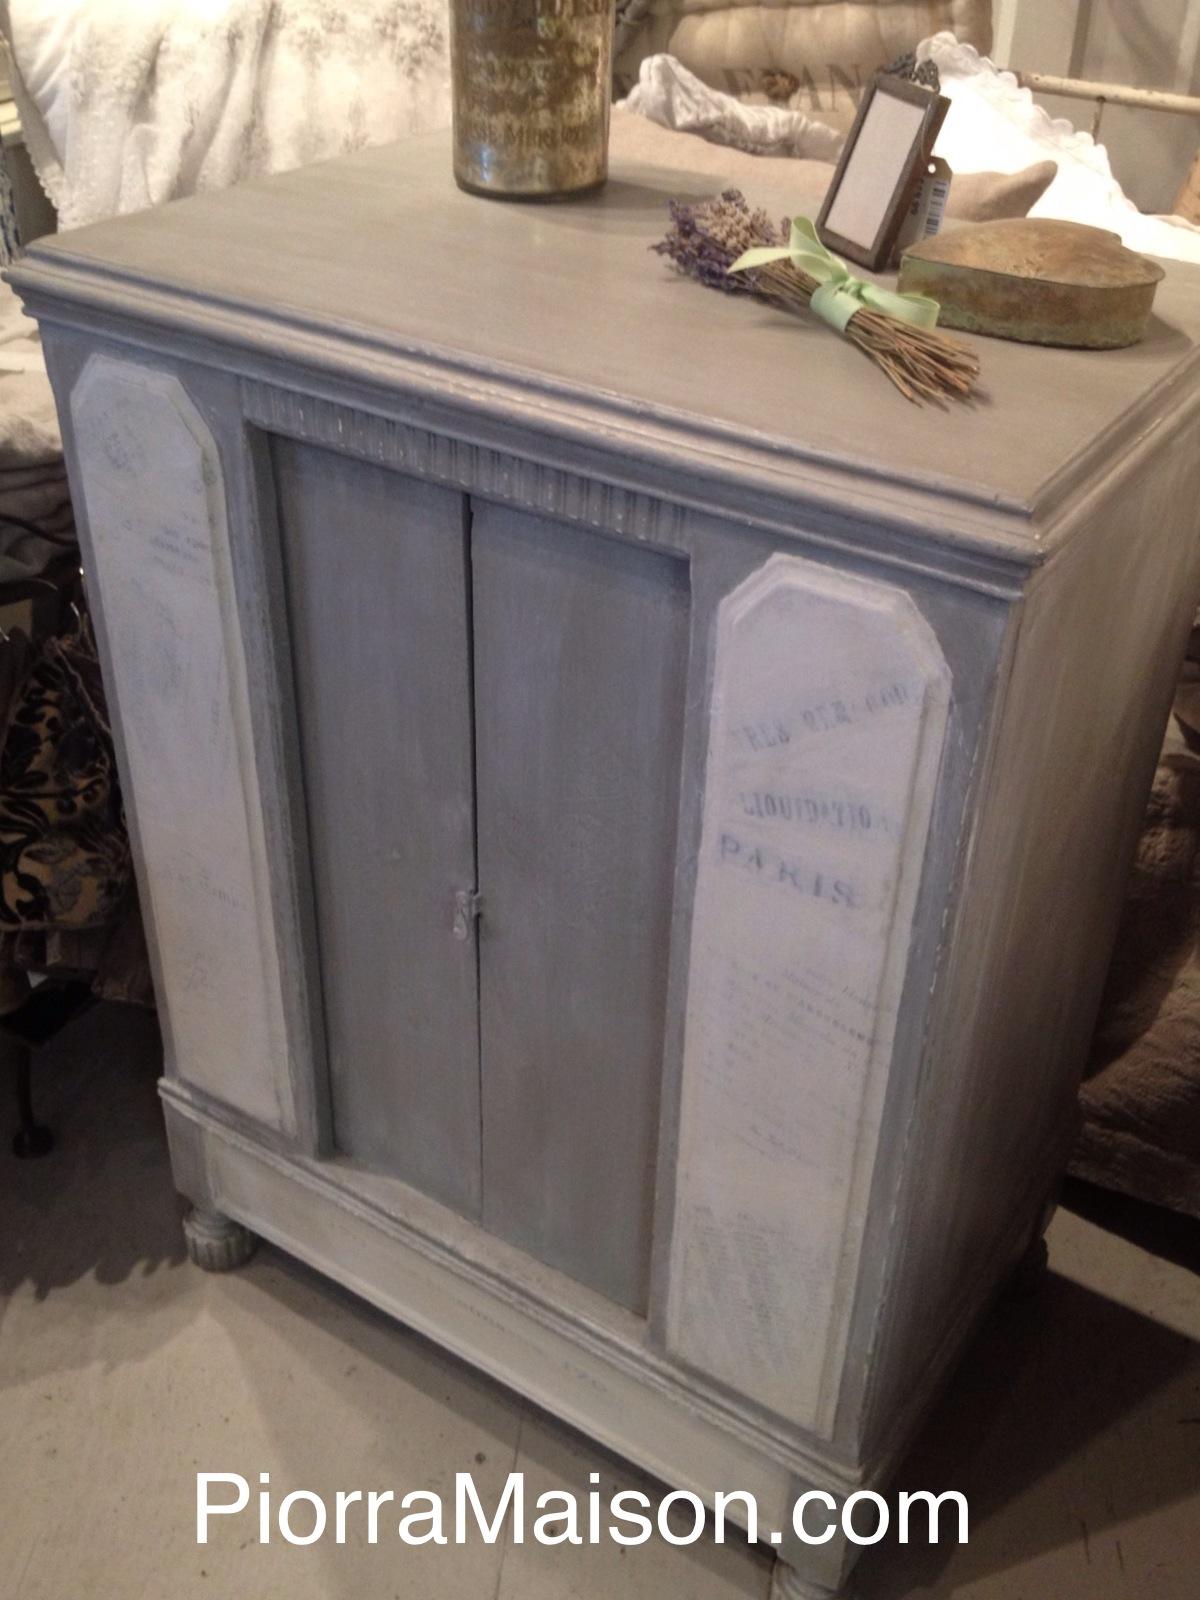 Piorra maison all things to inspire and desire chalk - Peinture a la craie pour meuble ...